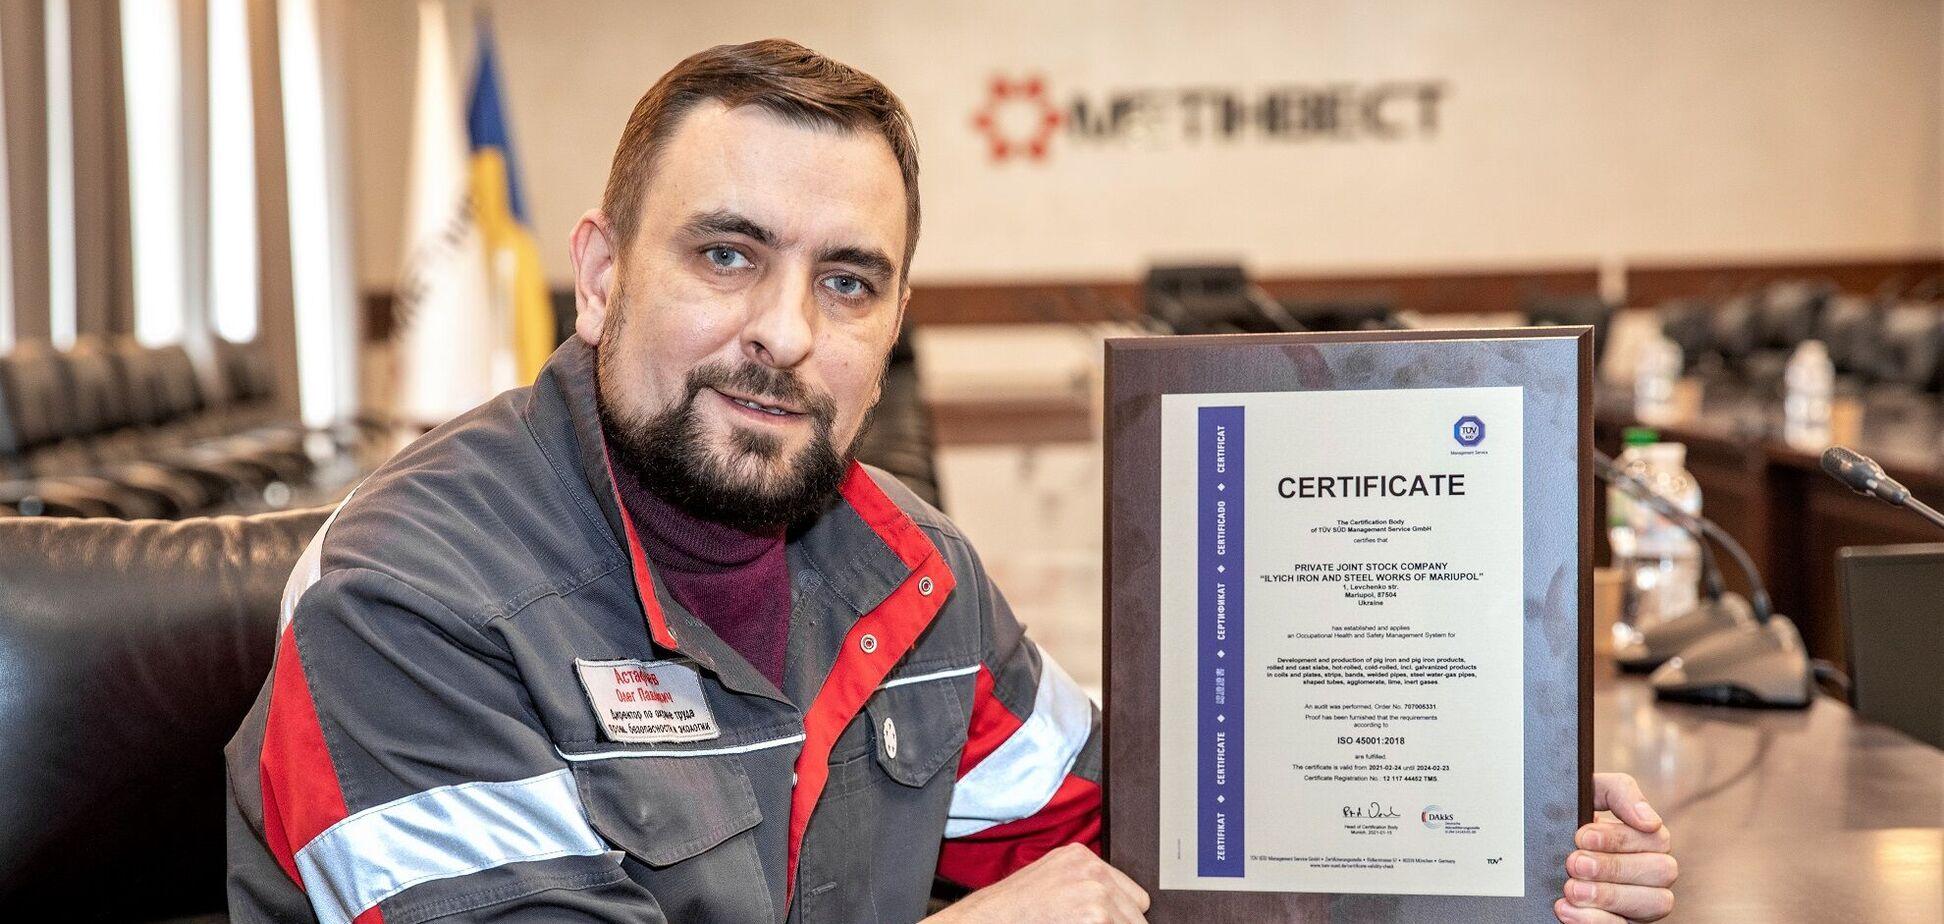 Меткомбинат Ильича Метинвеста получил сертификат по безопасности и охране труда